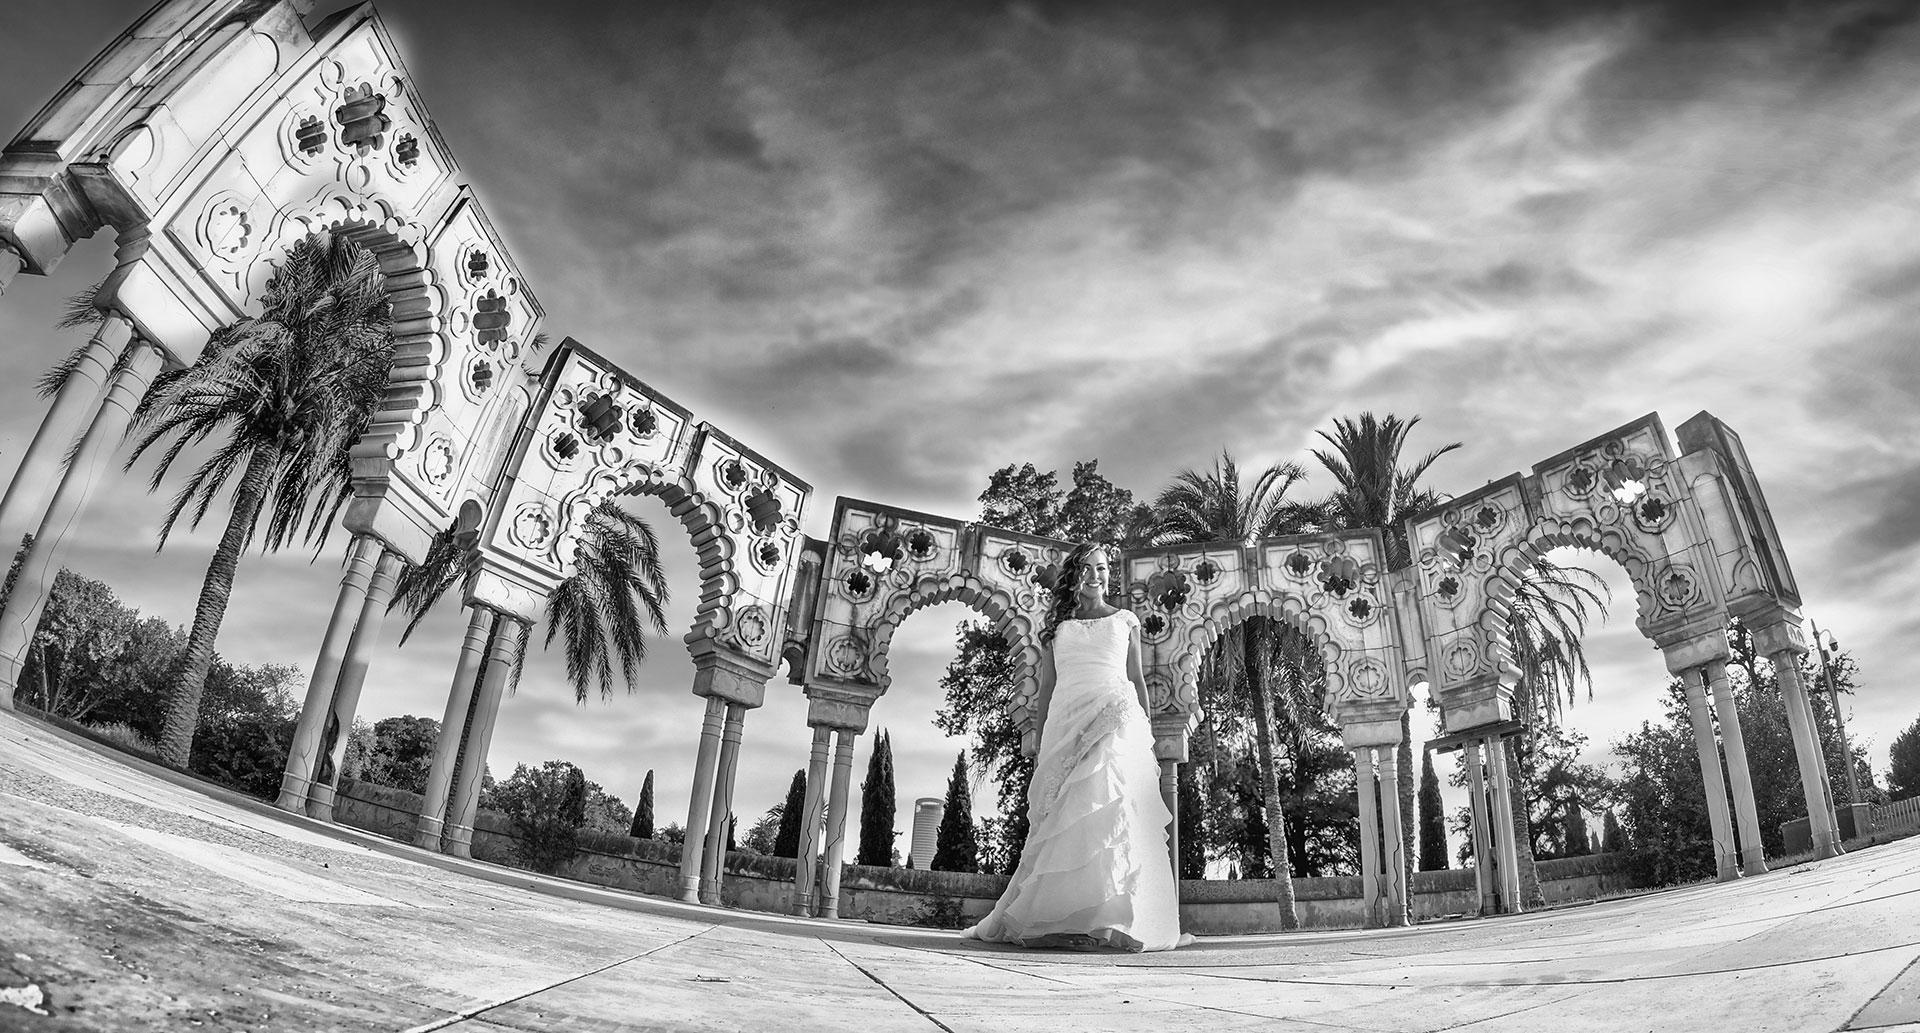 sesion fotos de boda pabellon de marruecos isla de la cartuja expo92